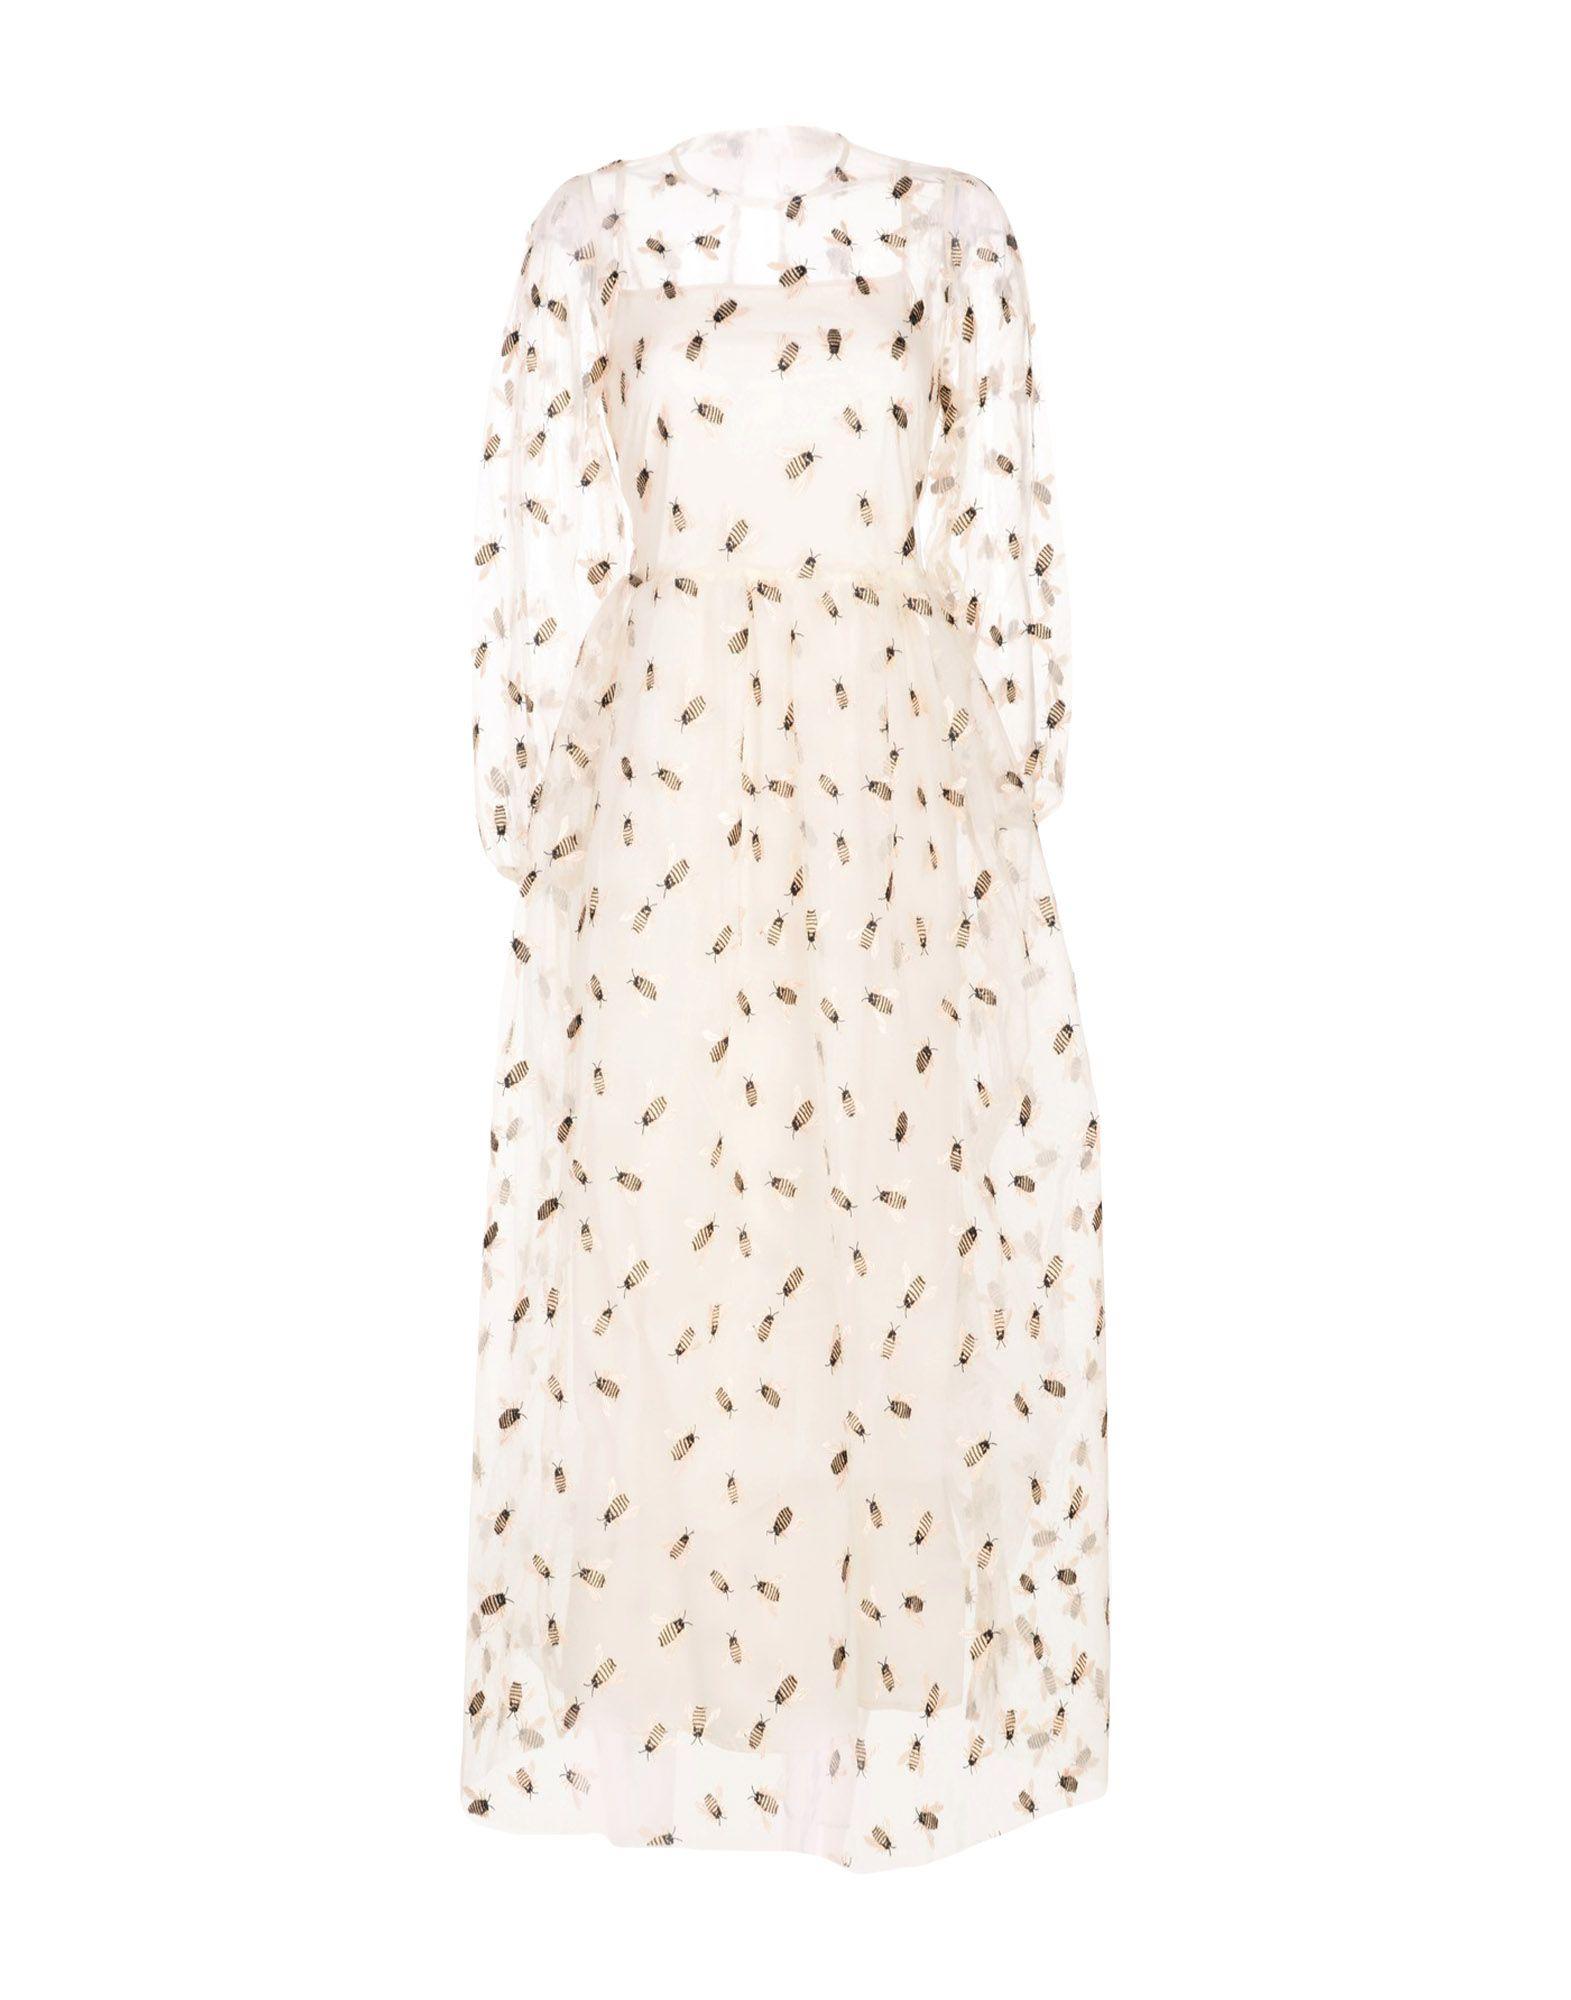 VICOLO Платье длиной 3/4 lisa corti платье длиной 3 4